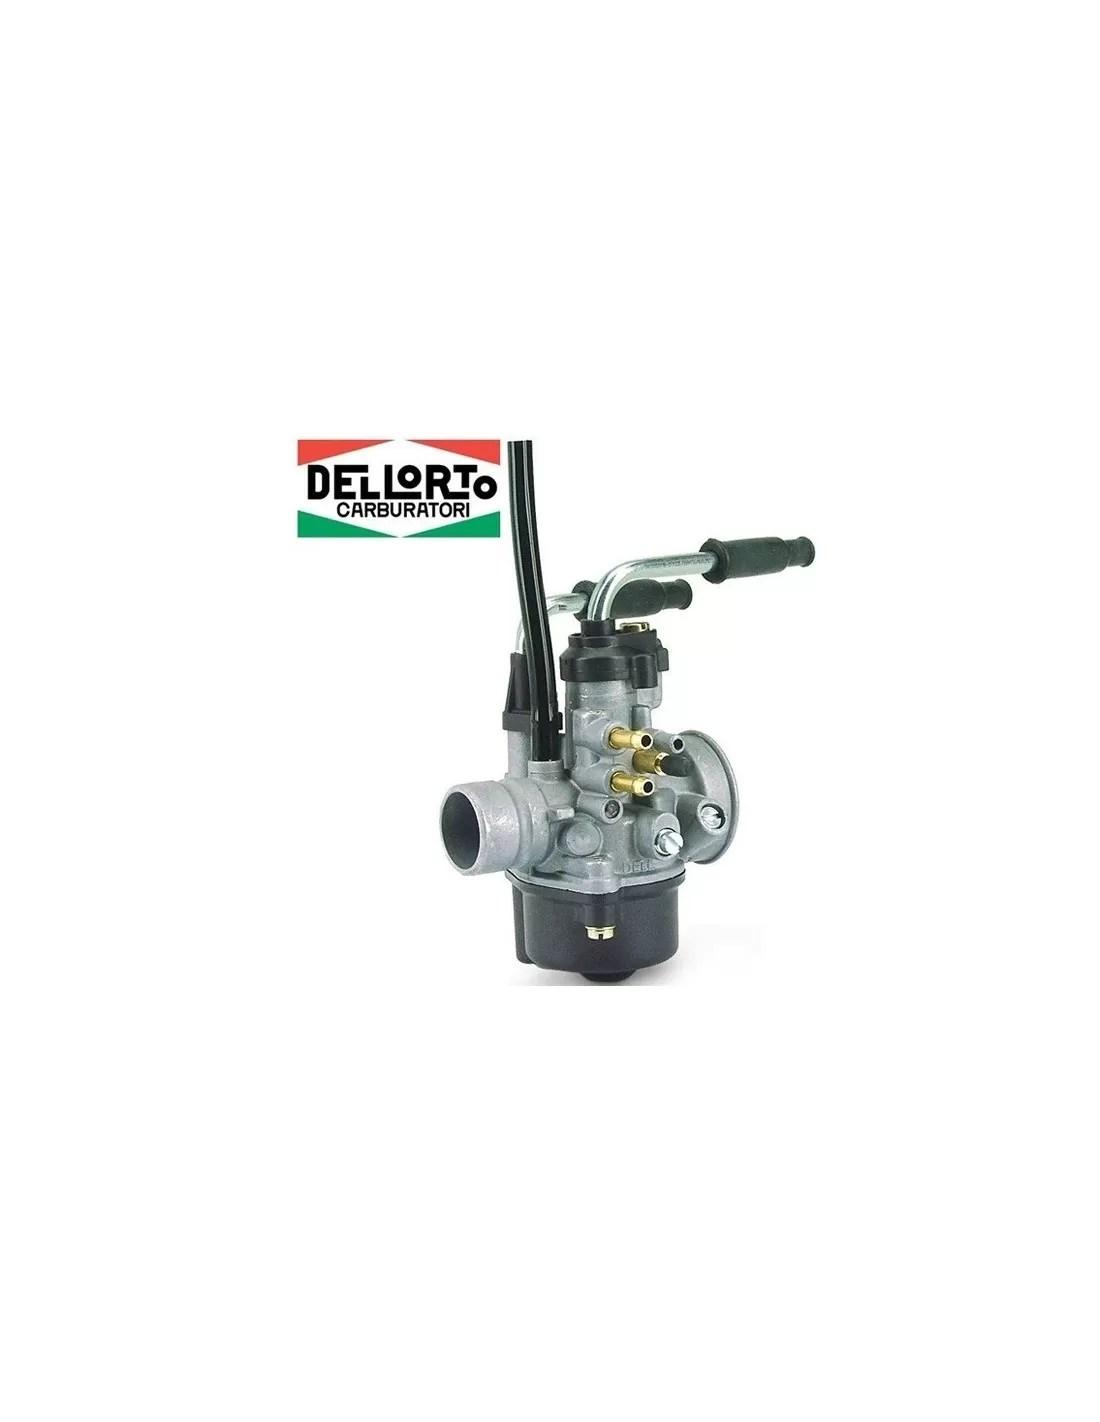 Karburator Dell Orto Phbn 17 5